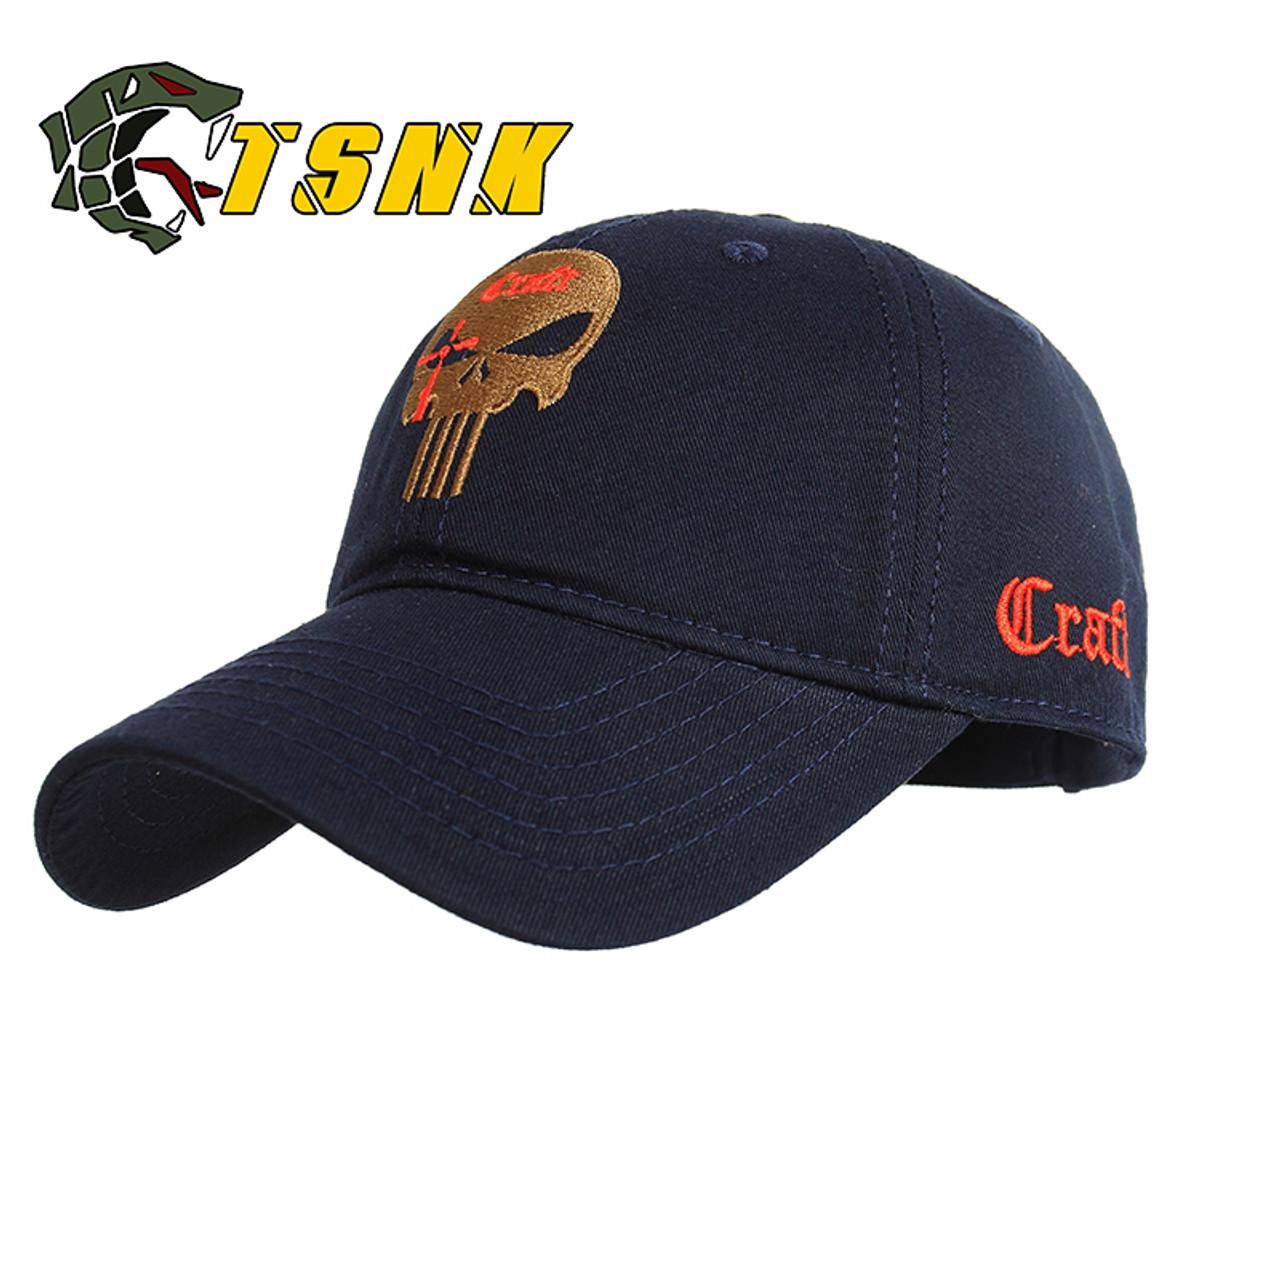 37c743e2bc9 ... TSNK Cotton Baseball Cap branded women men Tactical army caps Seals  Punisher American Sniper baseball hat ...